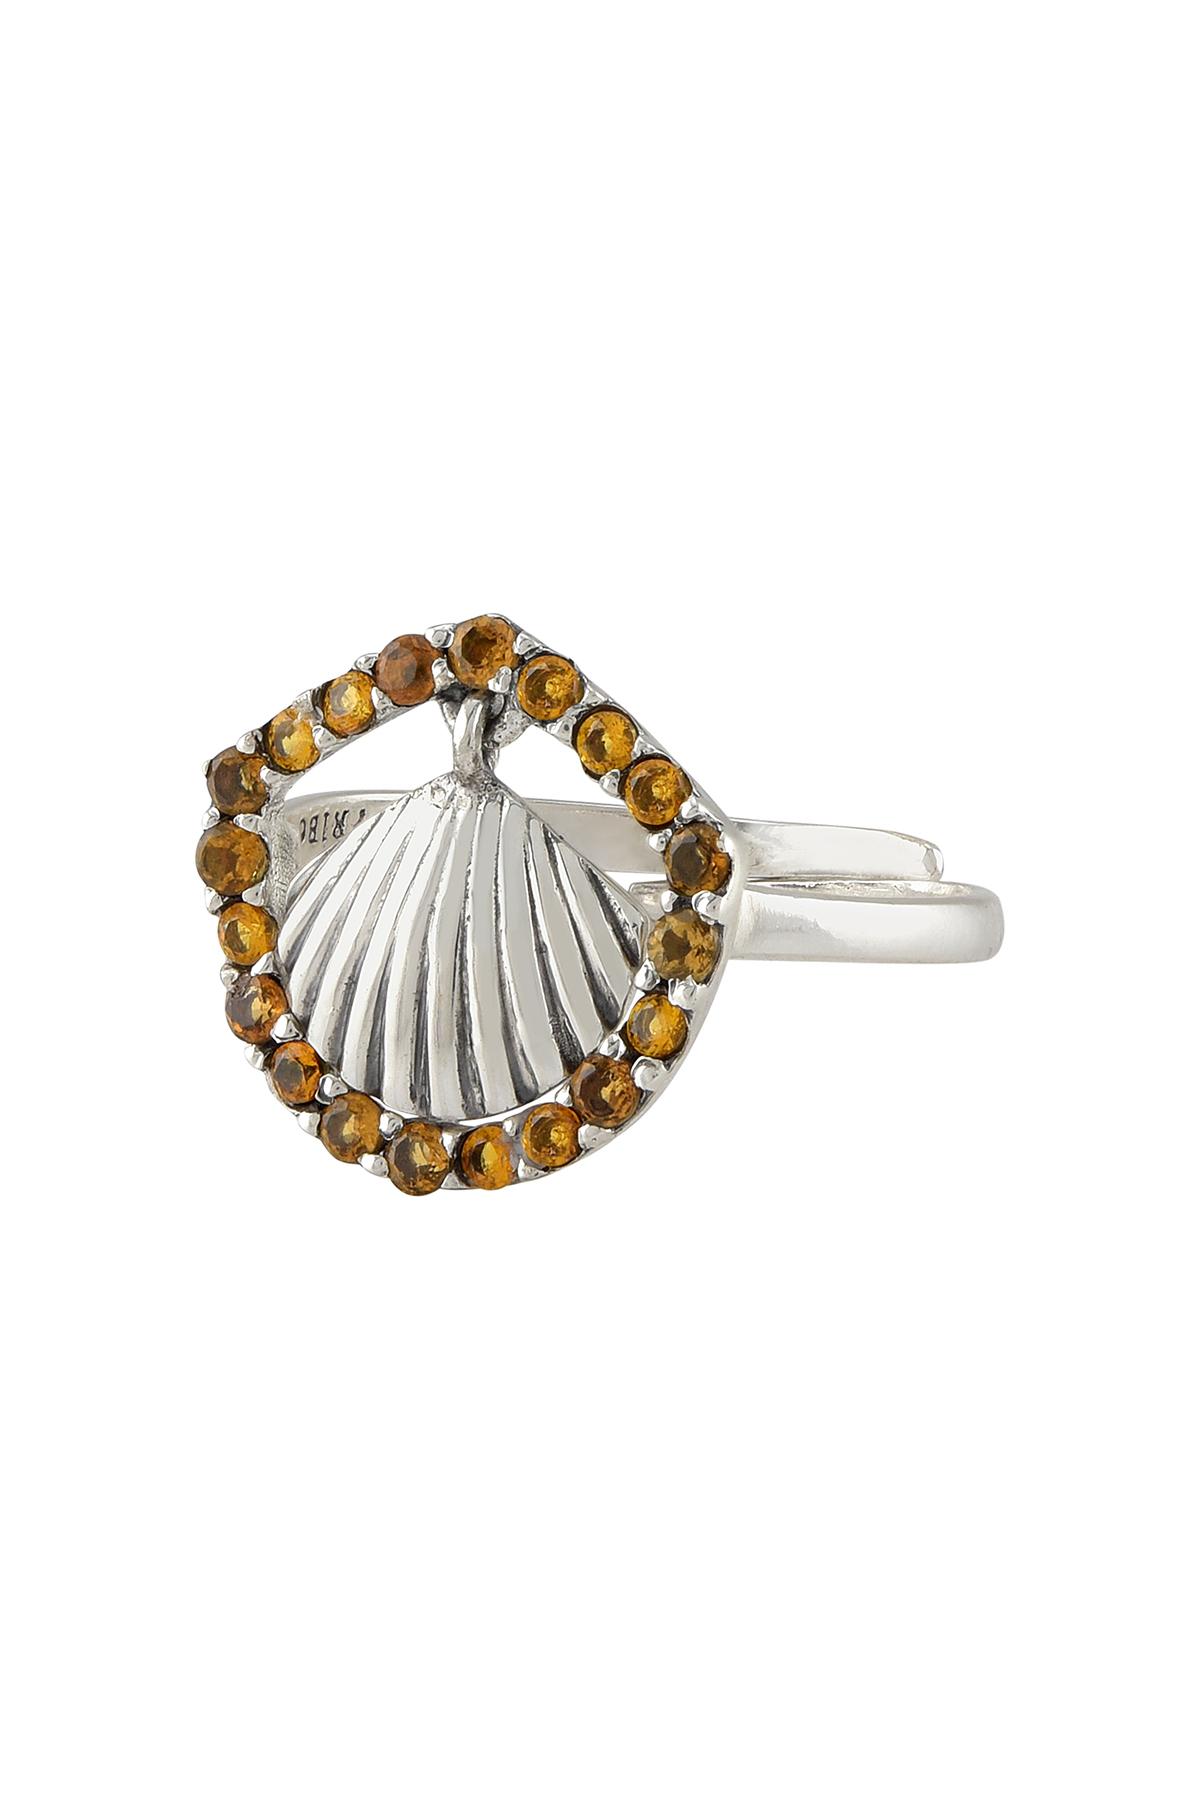 Silver Shell Charm Citrine Ring